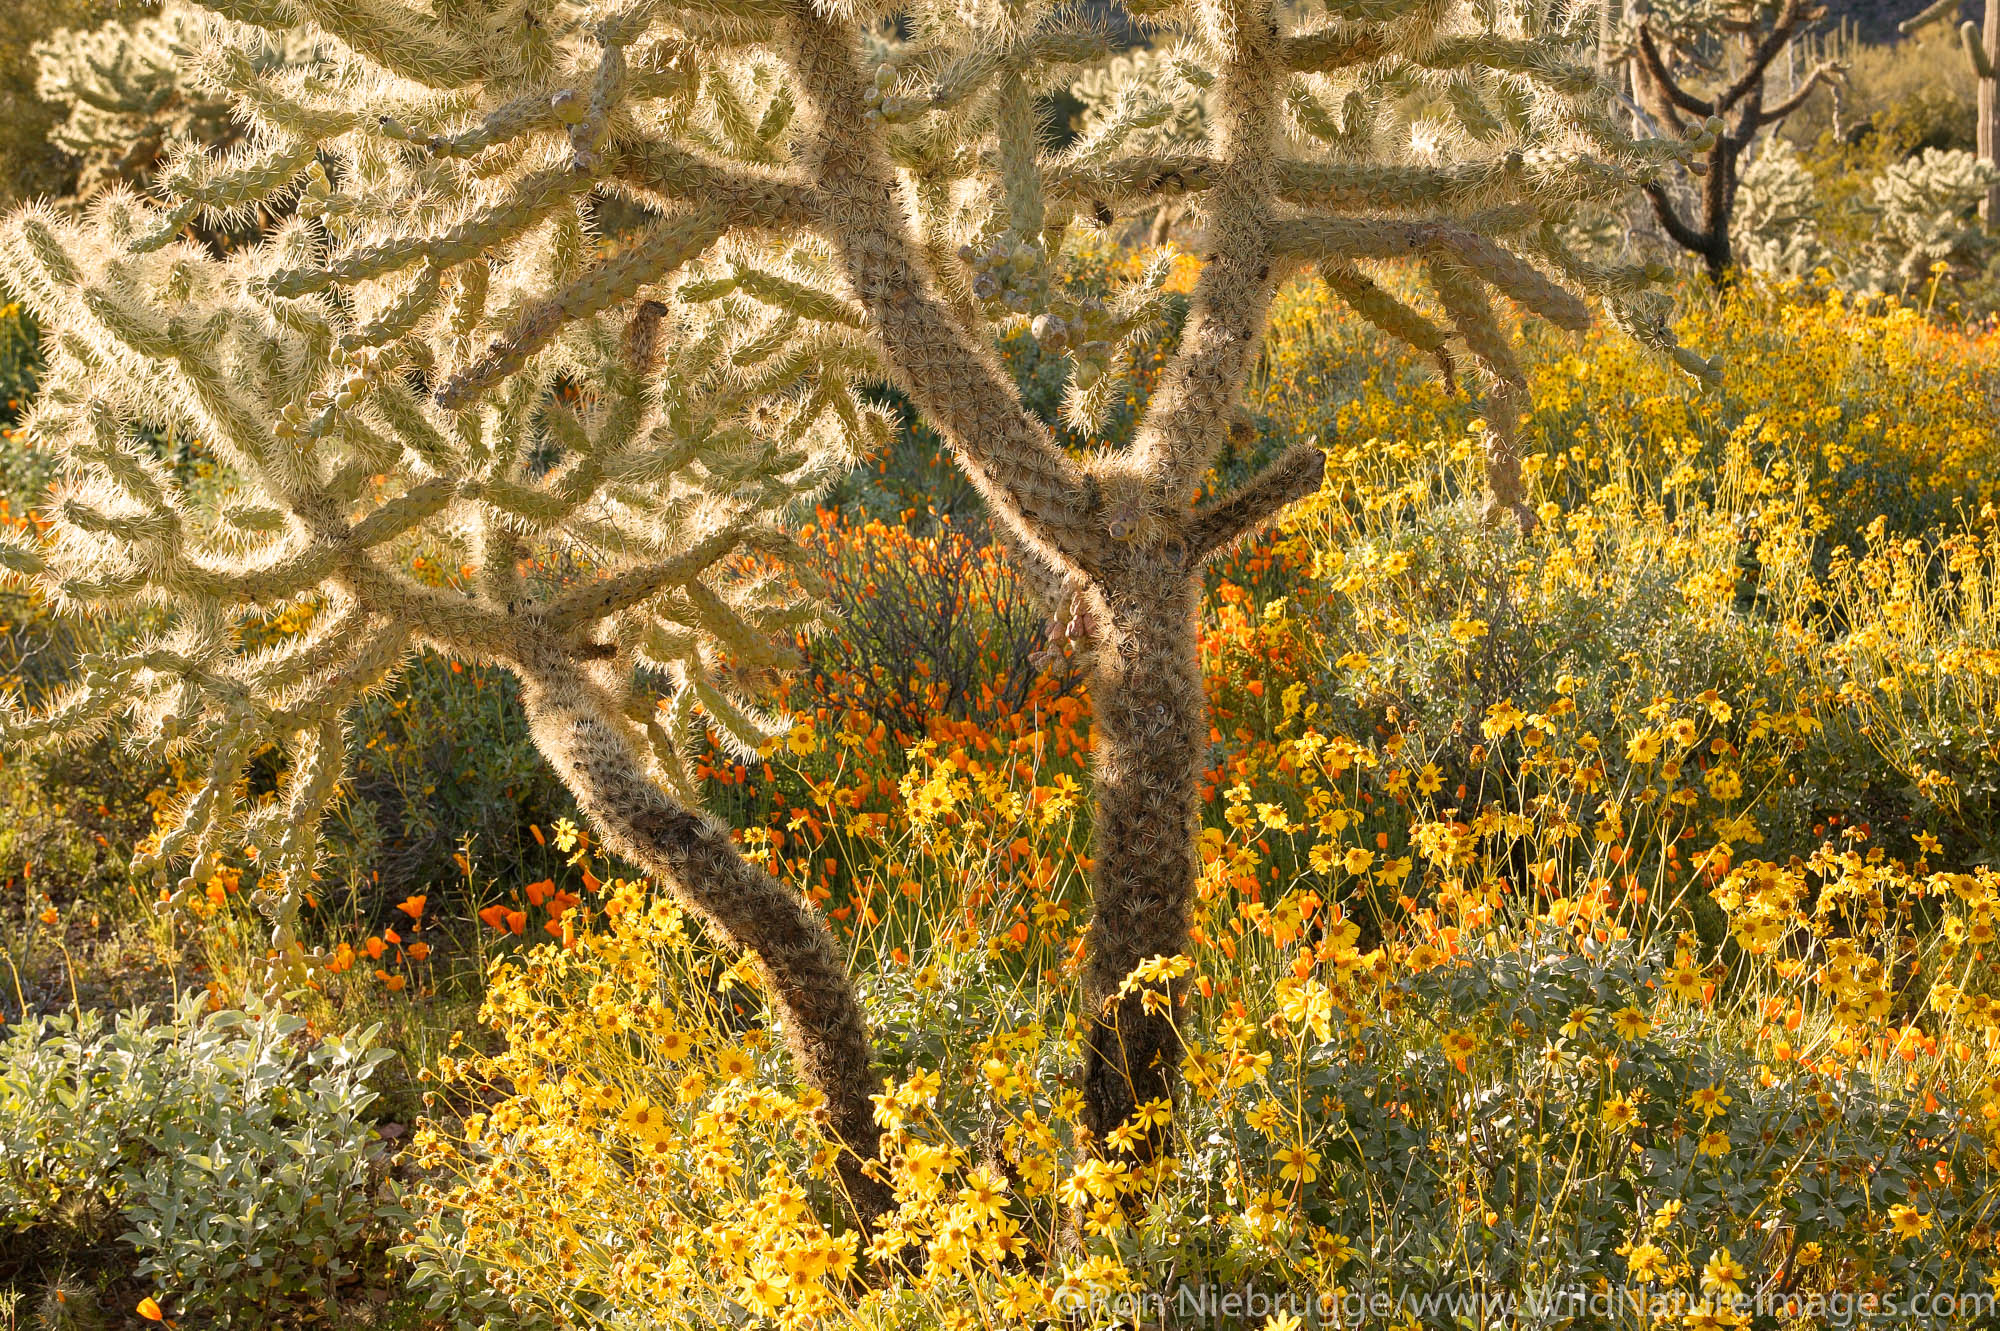 Teddy-bear Cholla cactus (Opuntia bigelovii) among the Mexican Gold Poppies (Eschscholzia californica subsp. mexicana) and Brittlebush...